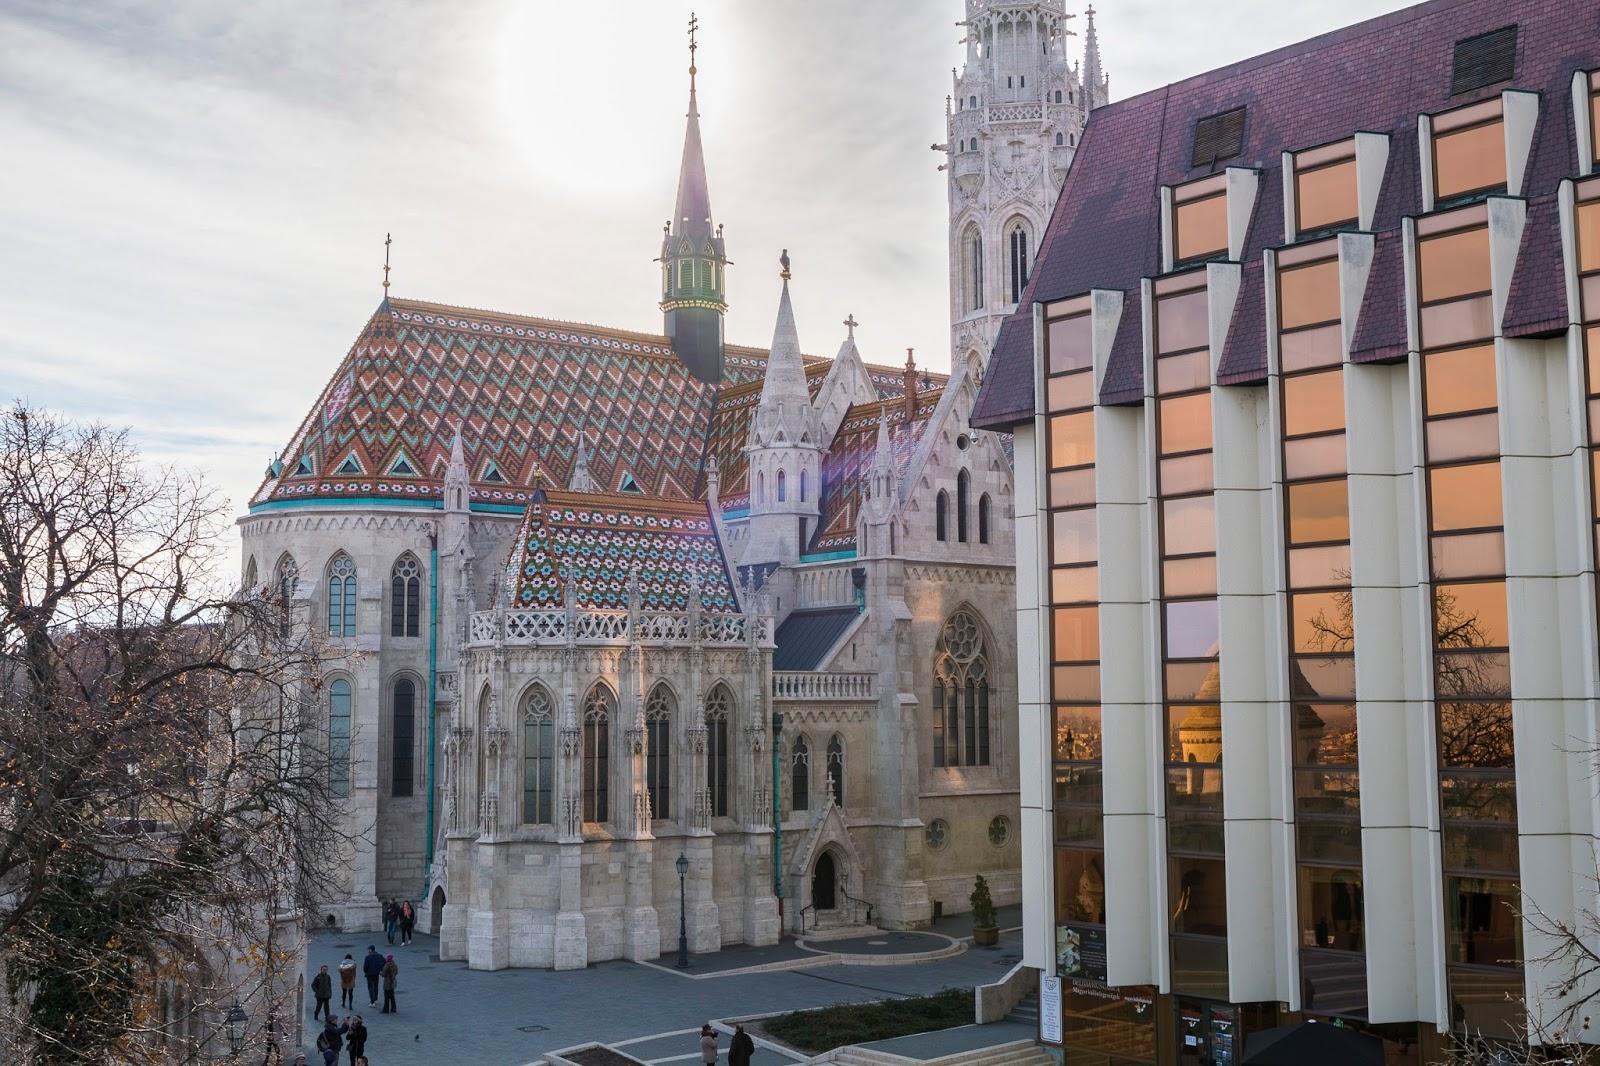 Eglise Notre Dame Budapest